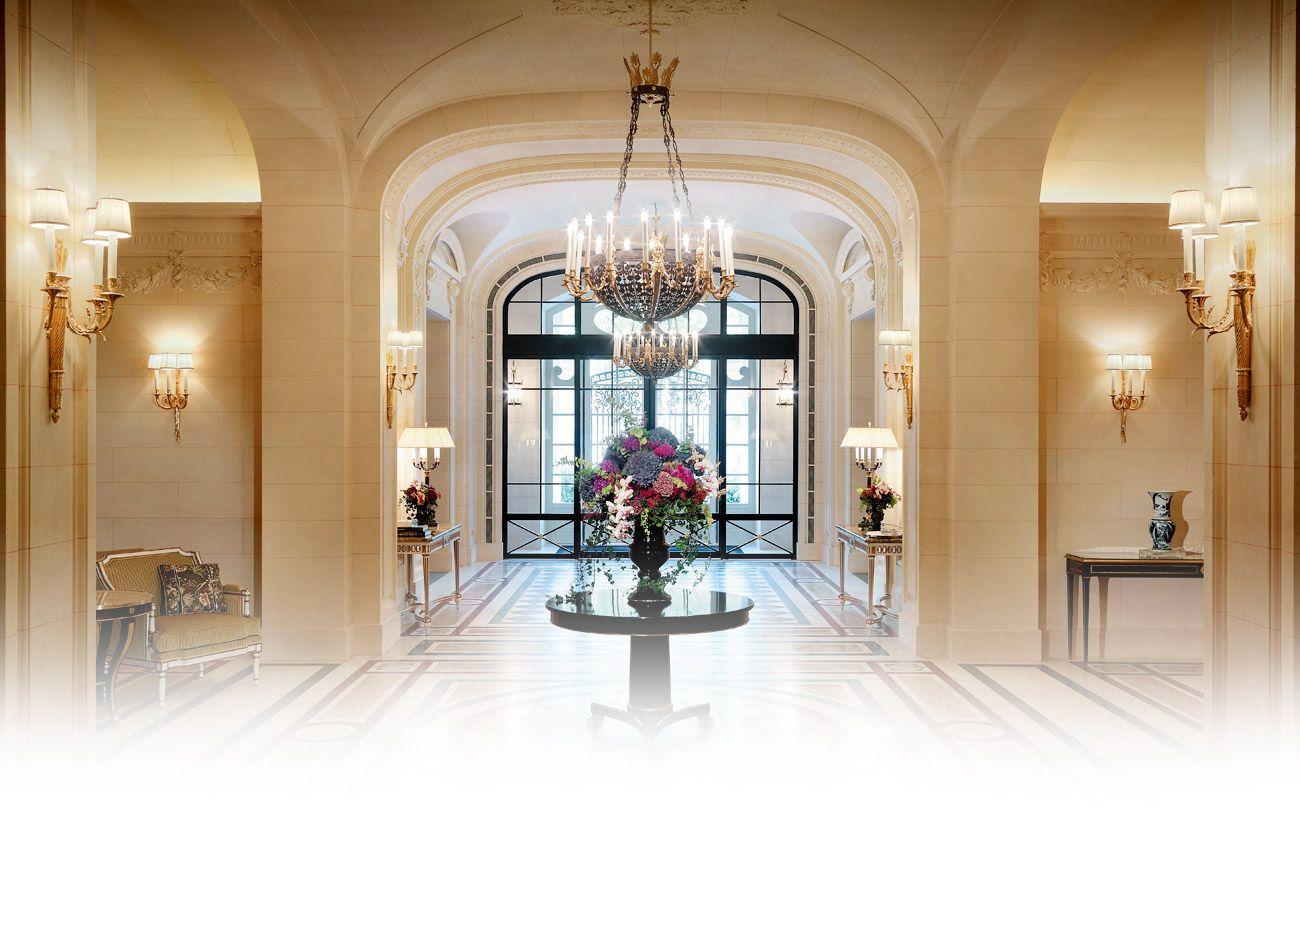 La Hotel, Paris launches 100 Vegan Afternoon Tea